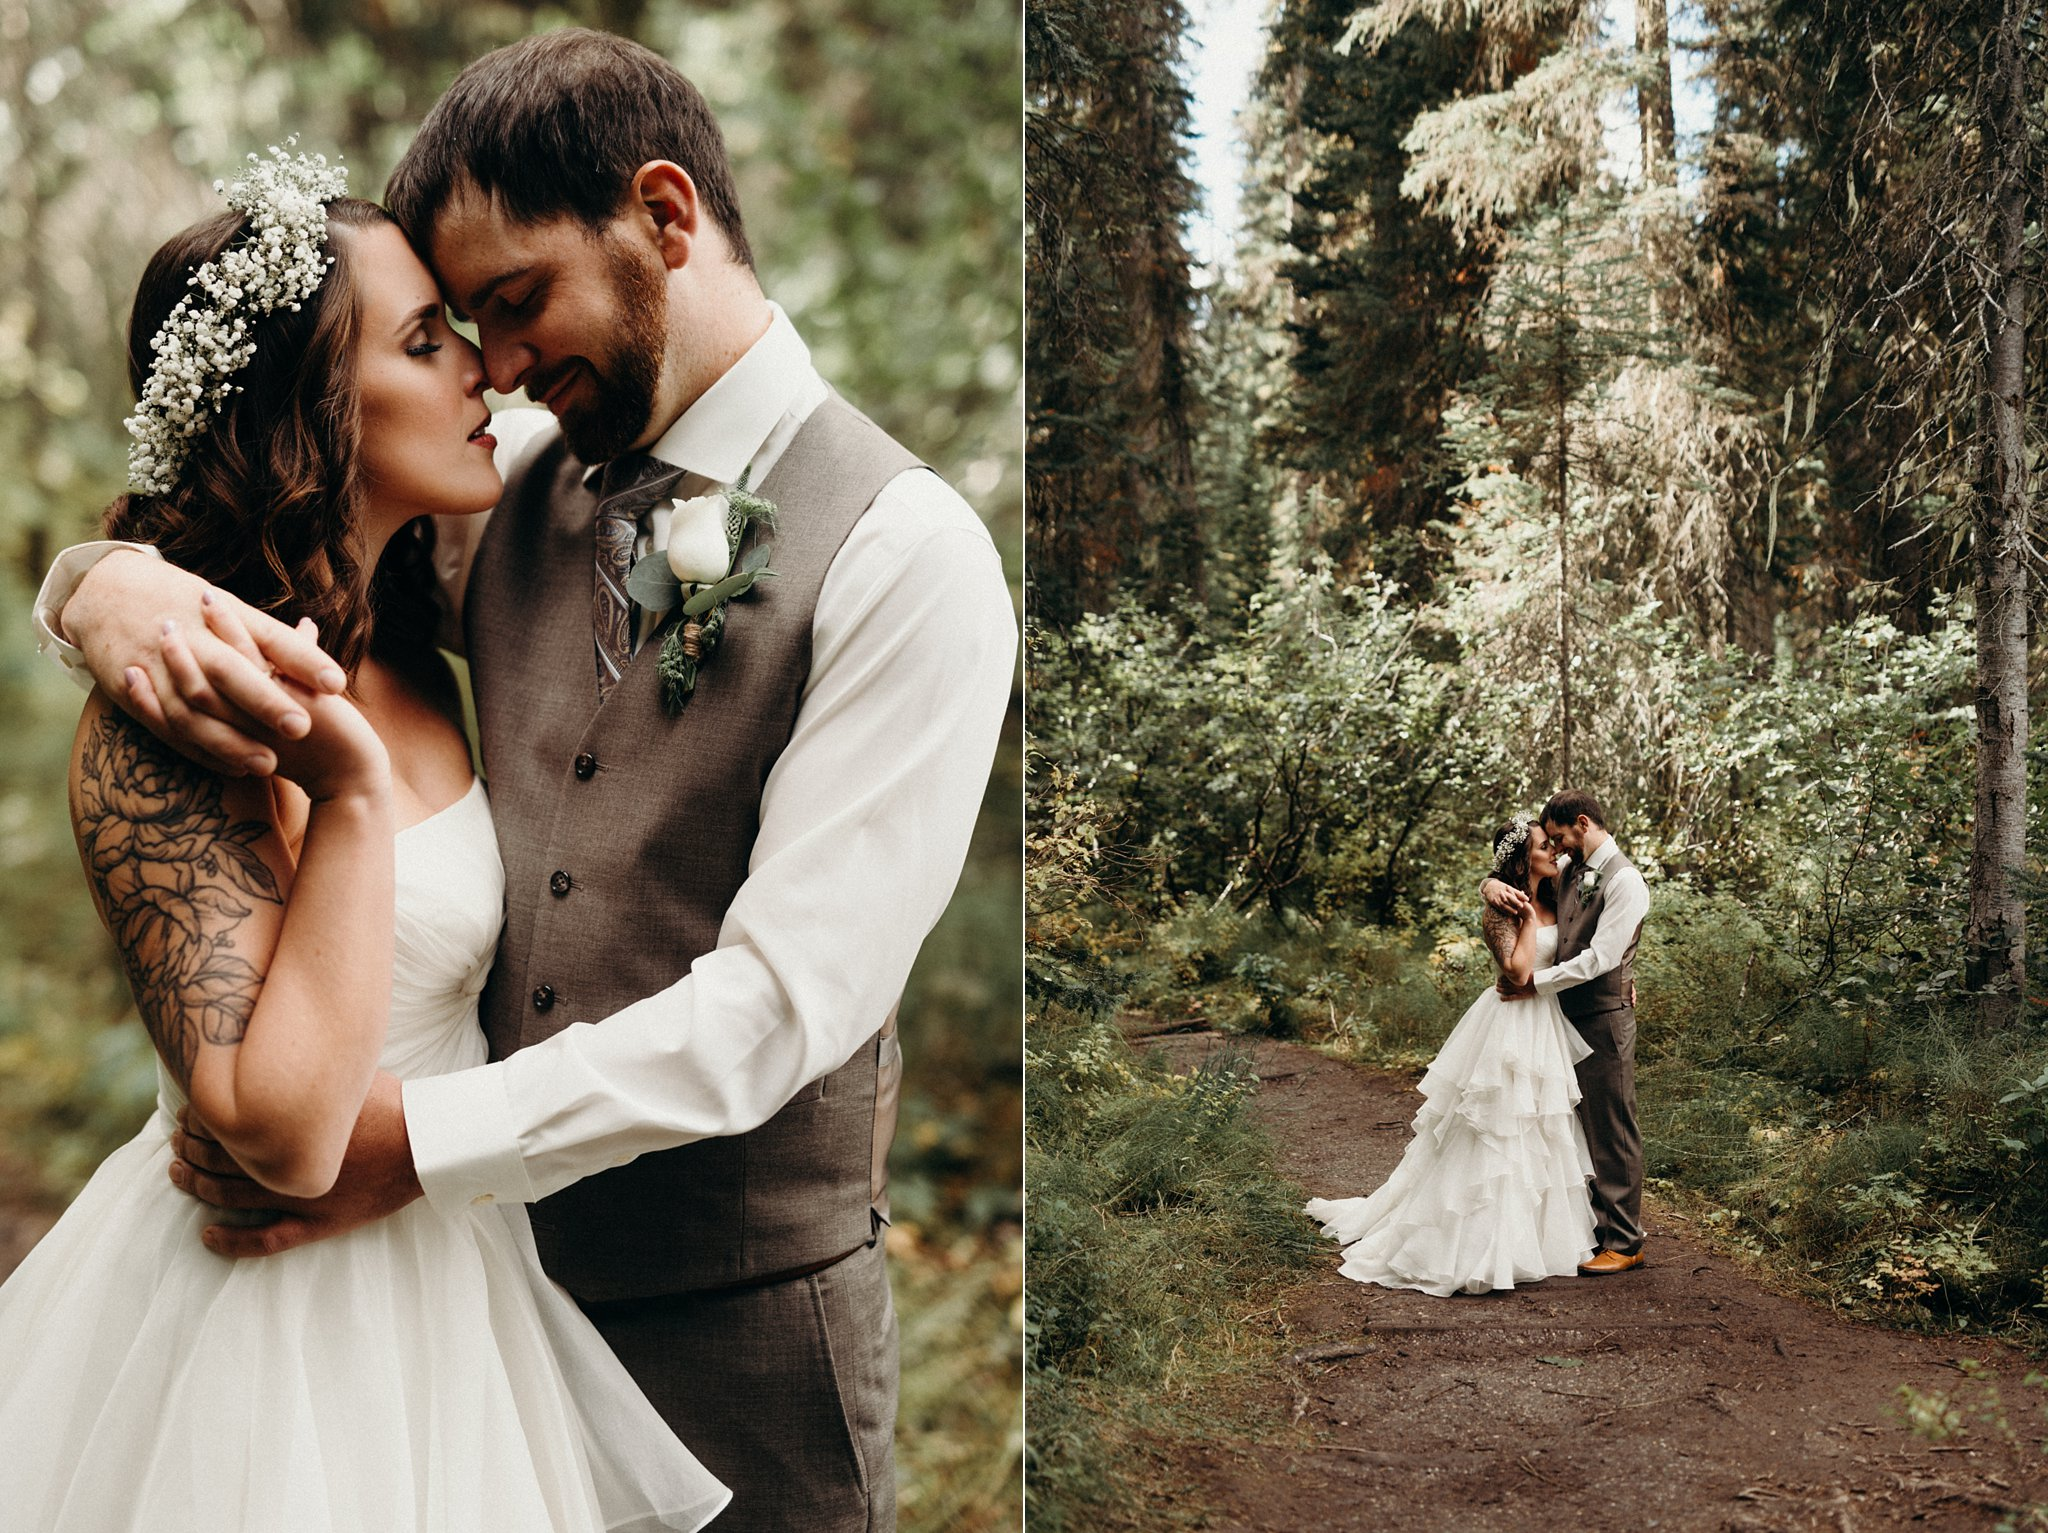 kaihla_tonai_intimate_wedding_elopement_photographer_6889.jpg